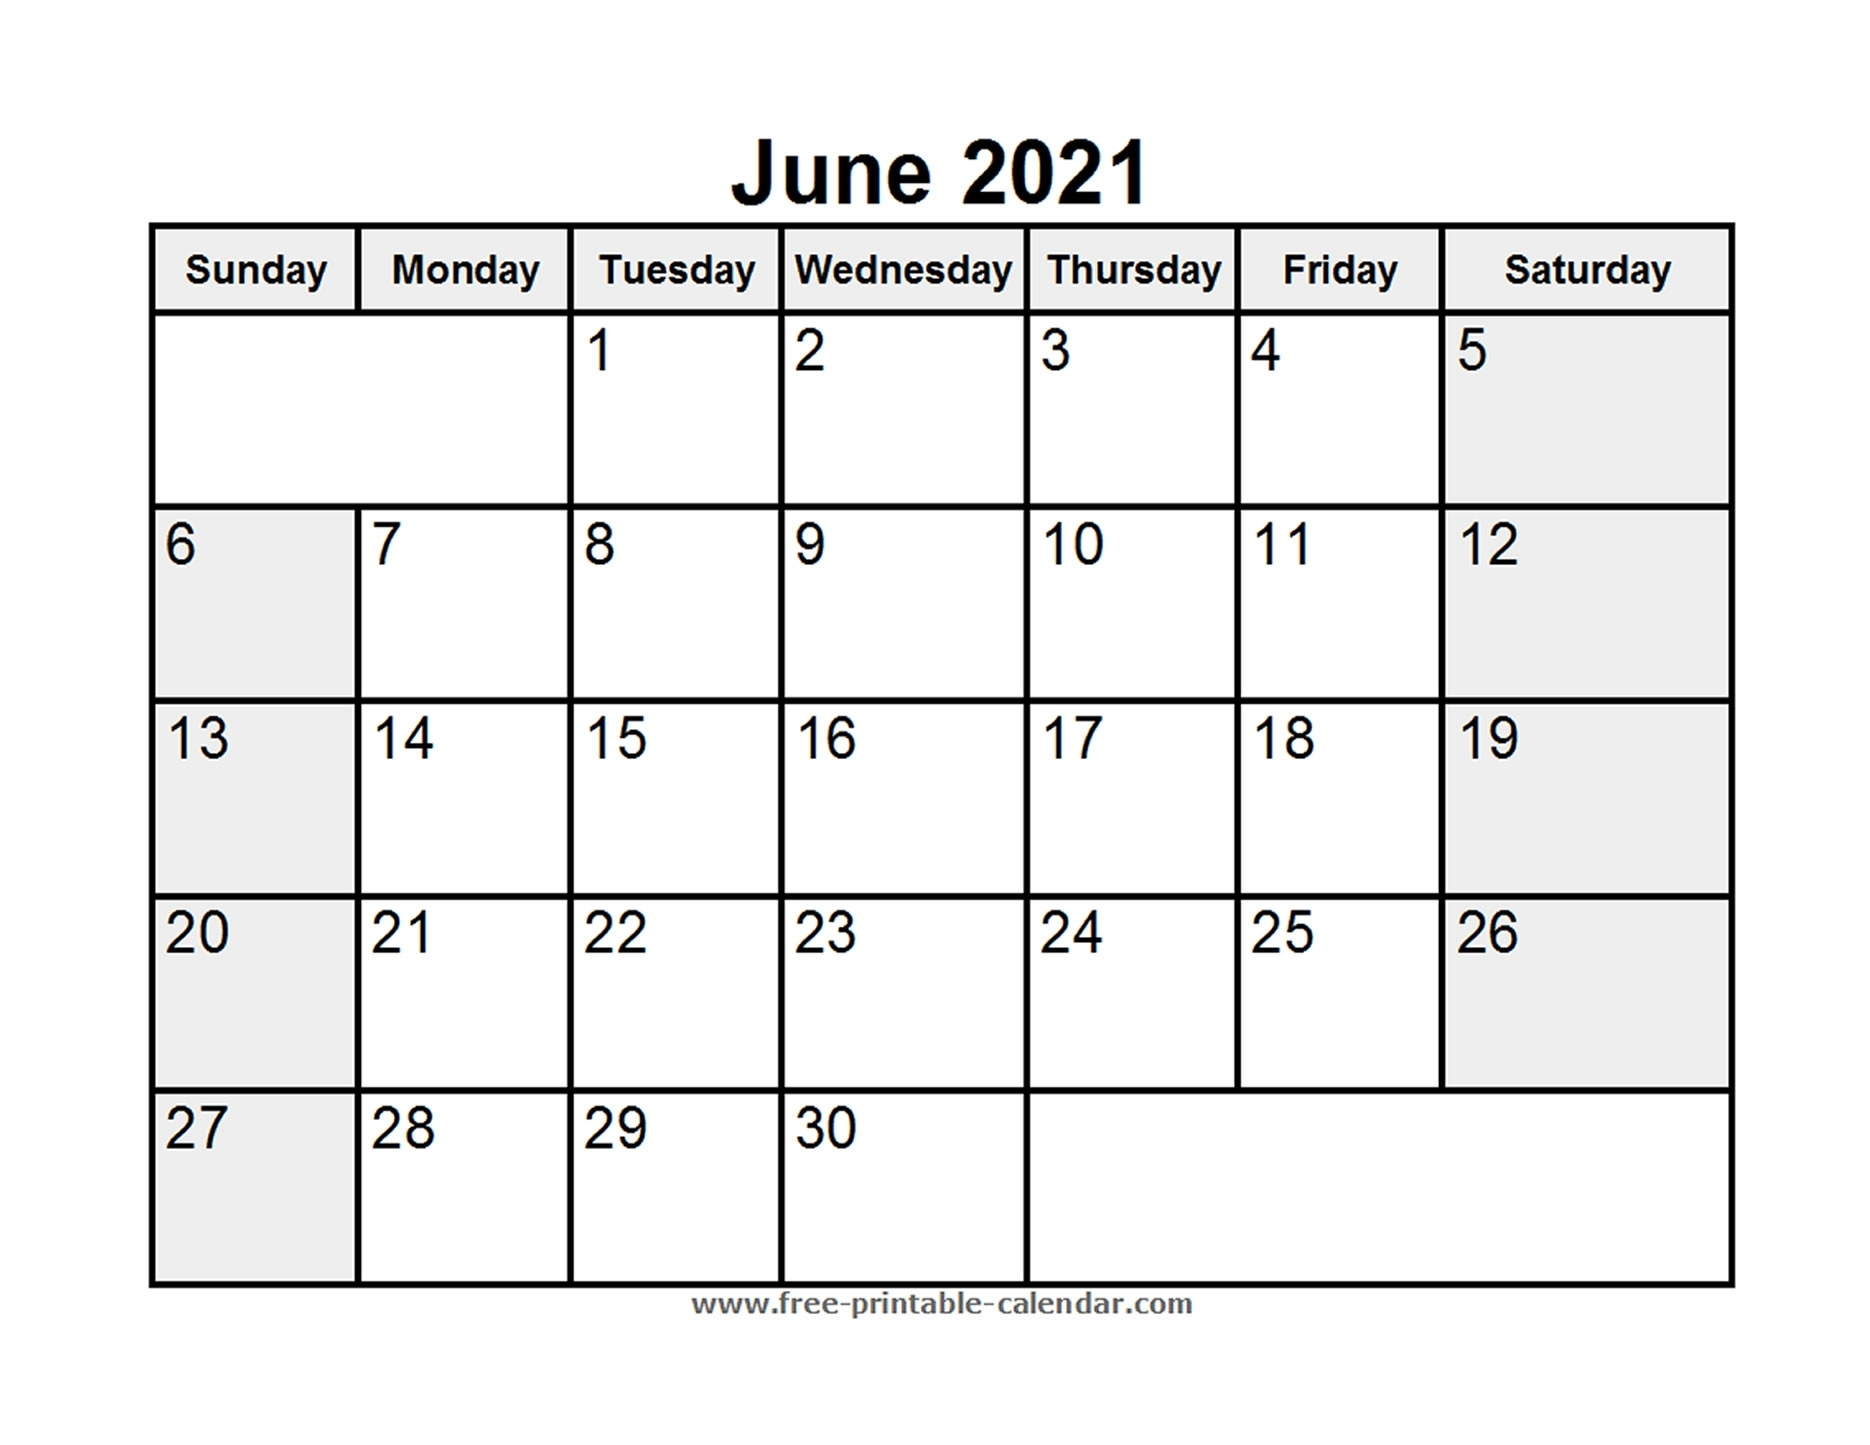 Printable June 2021 Calendar - Free-Printable-Calendar June 2020 To June 2021 Calendar Printable